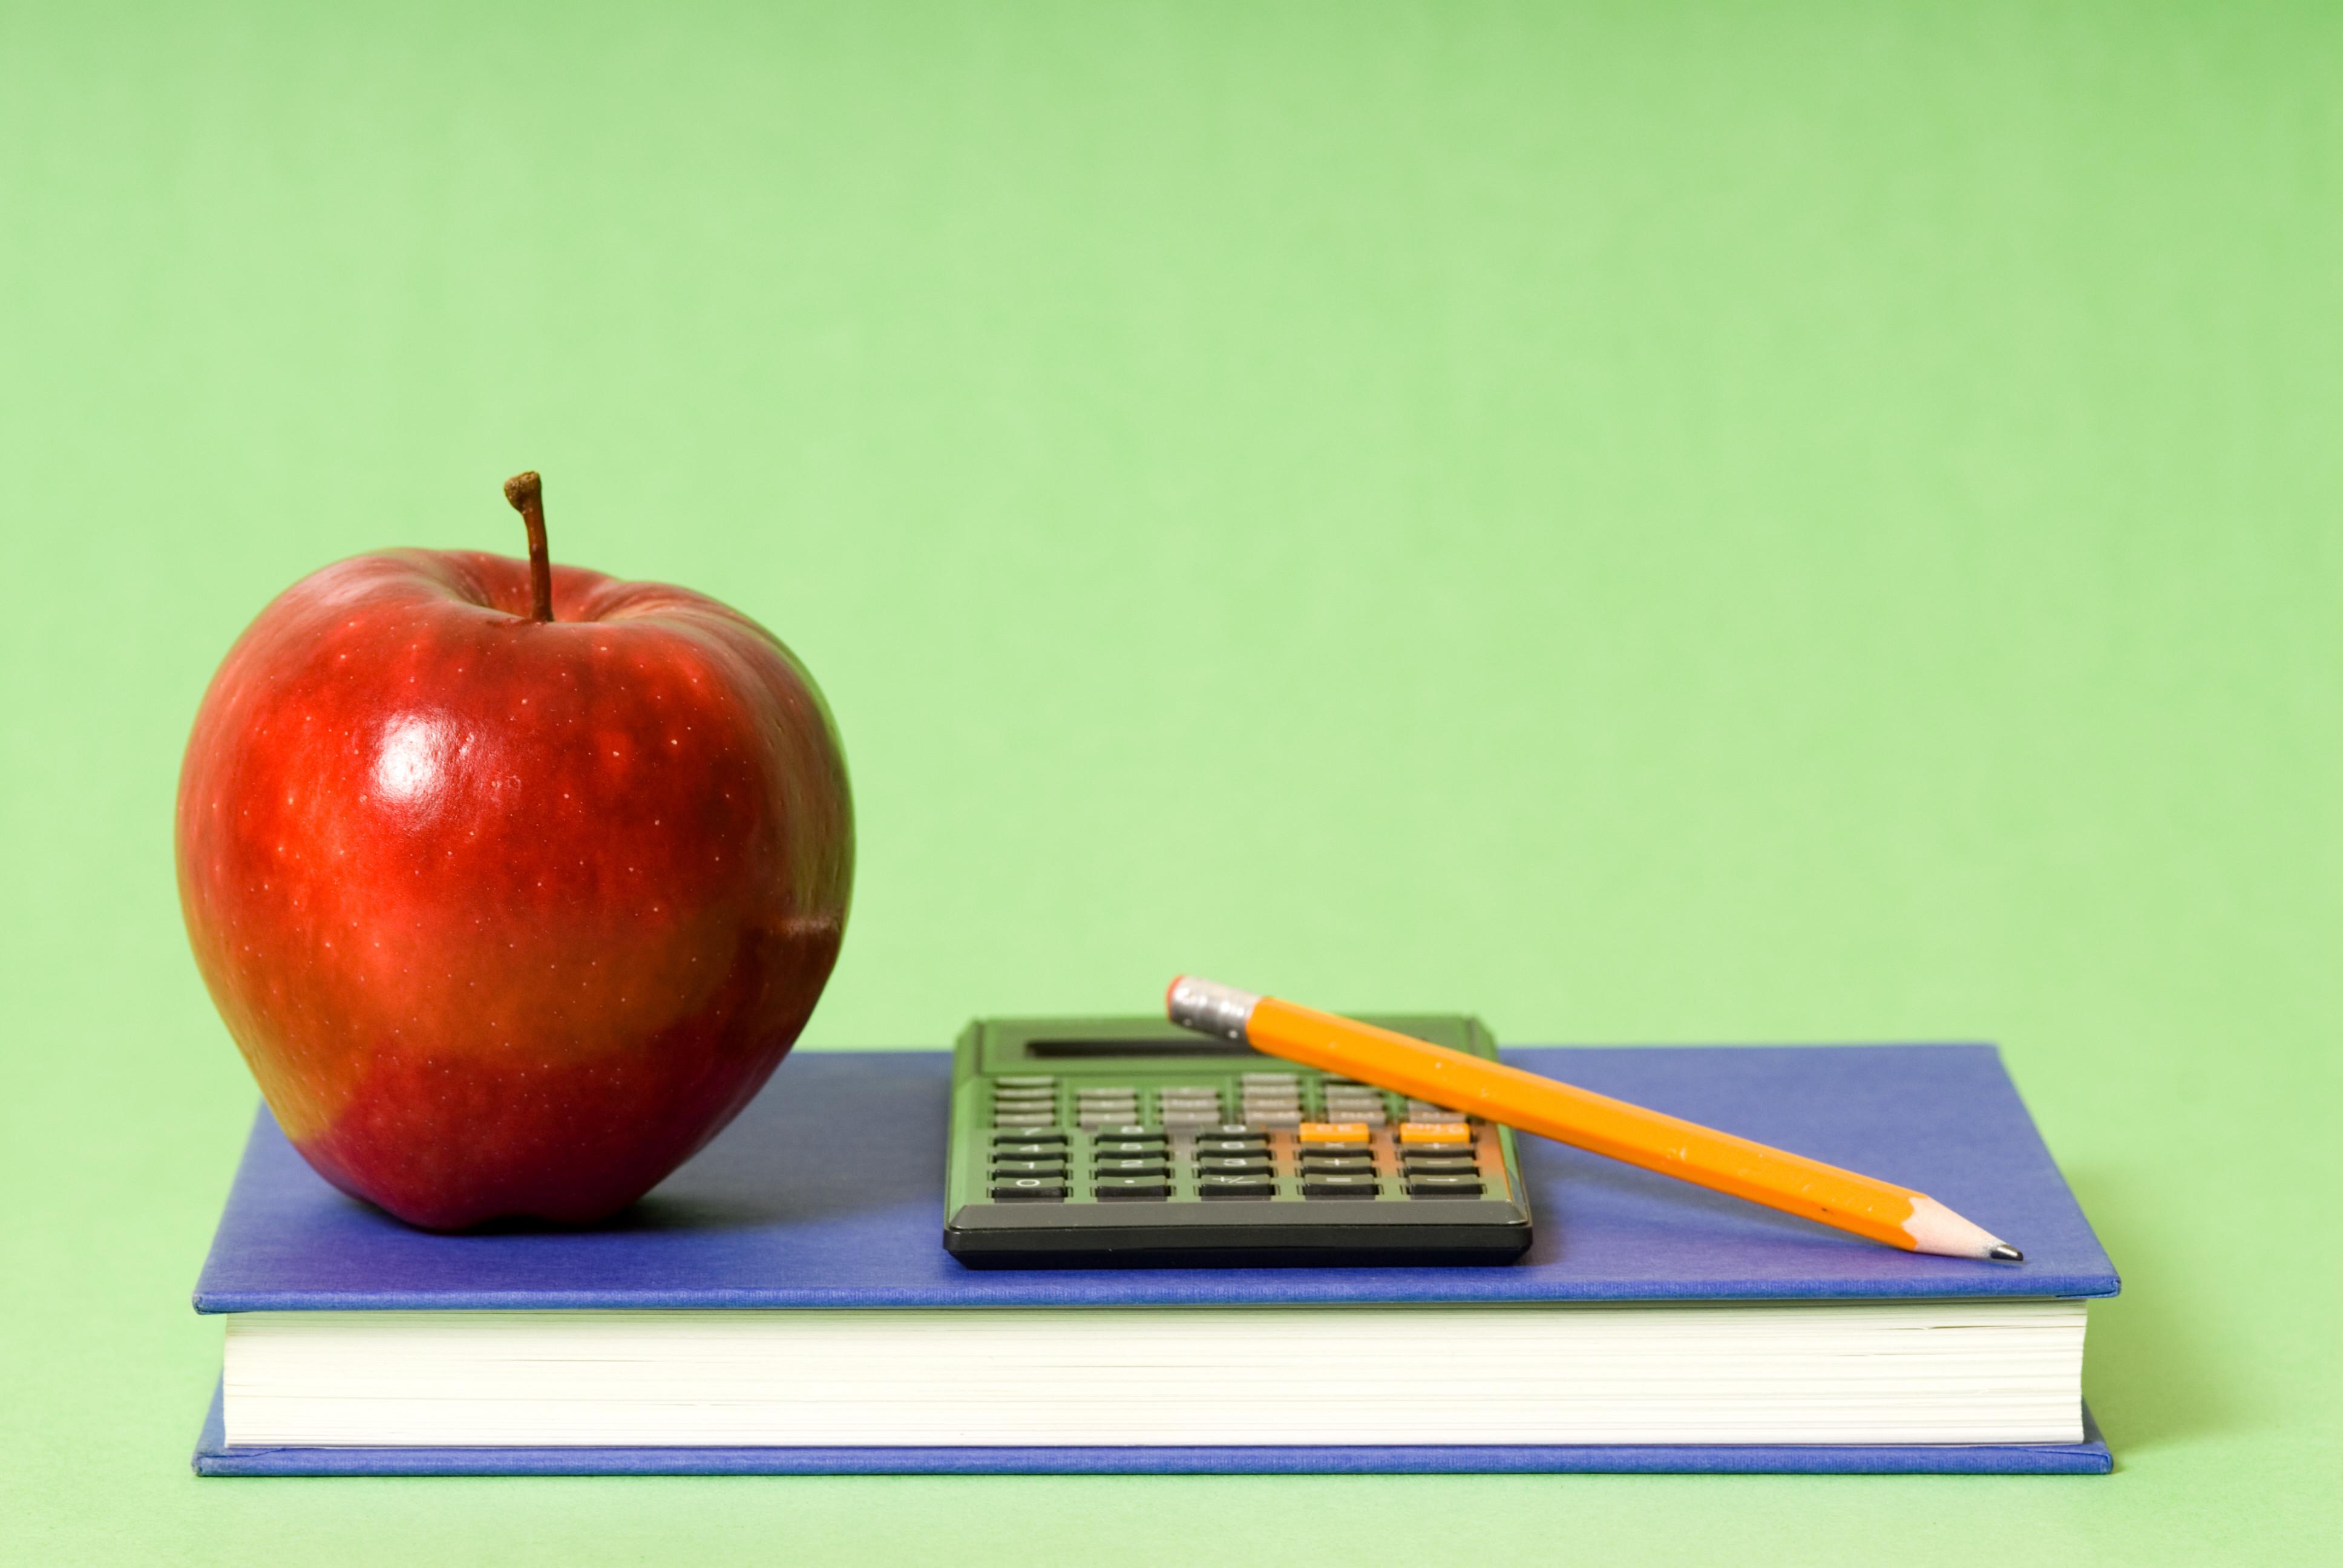 Book, apple, pencil and calculator - basic school stuff